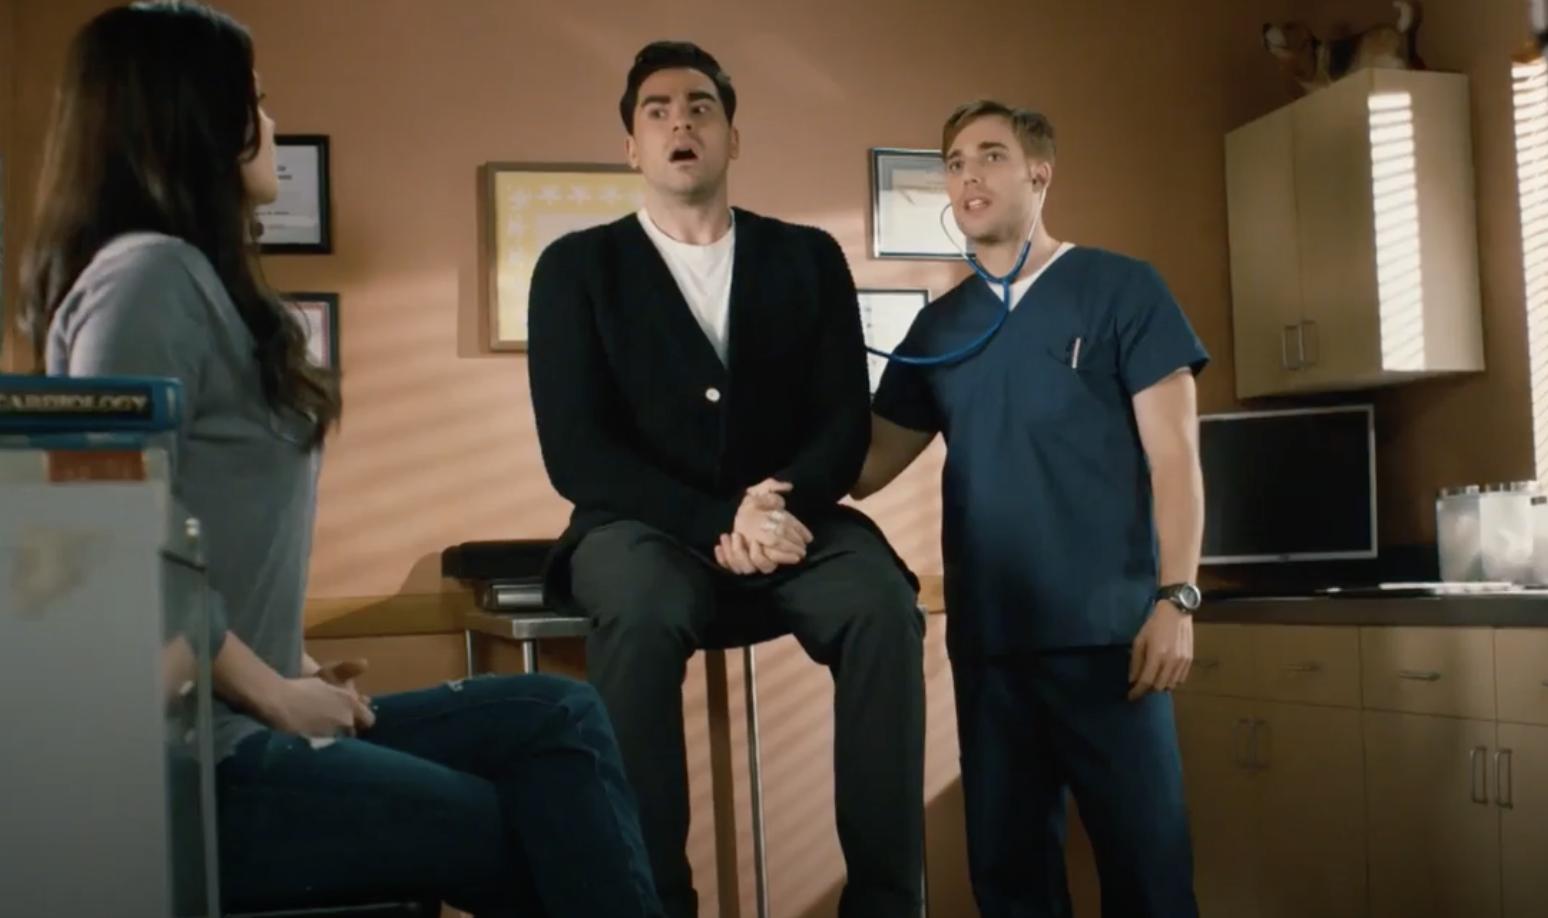 Dustin and Dan in a doctor's office scene